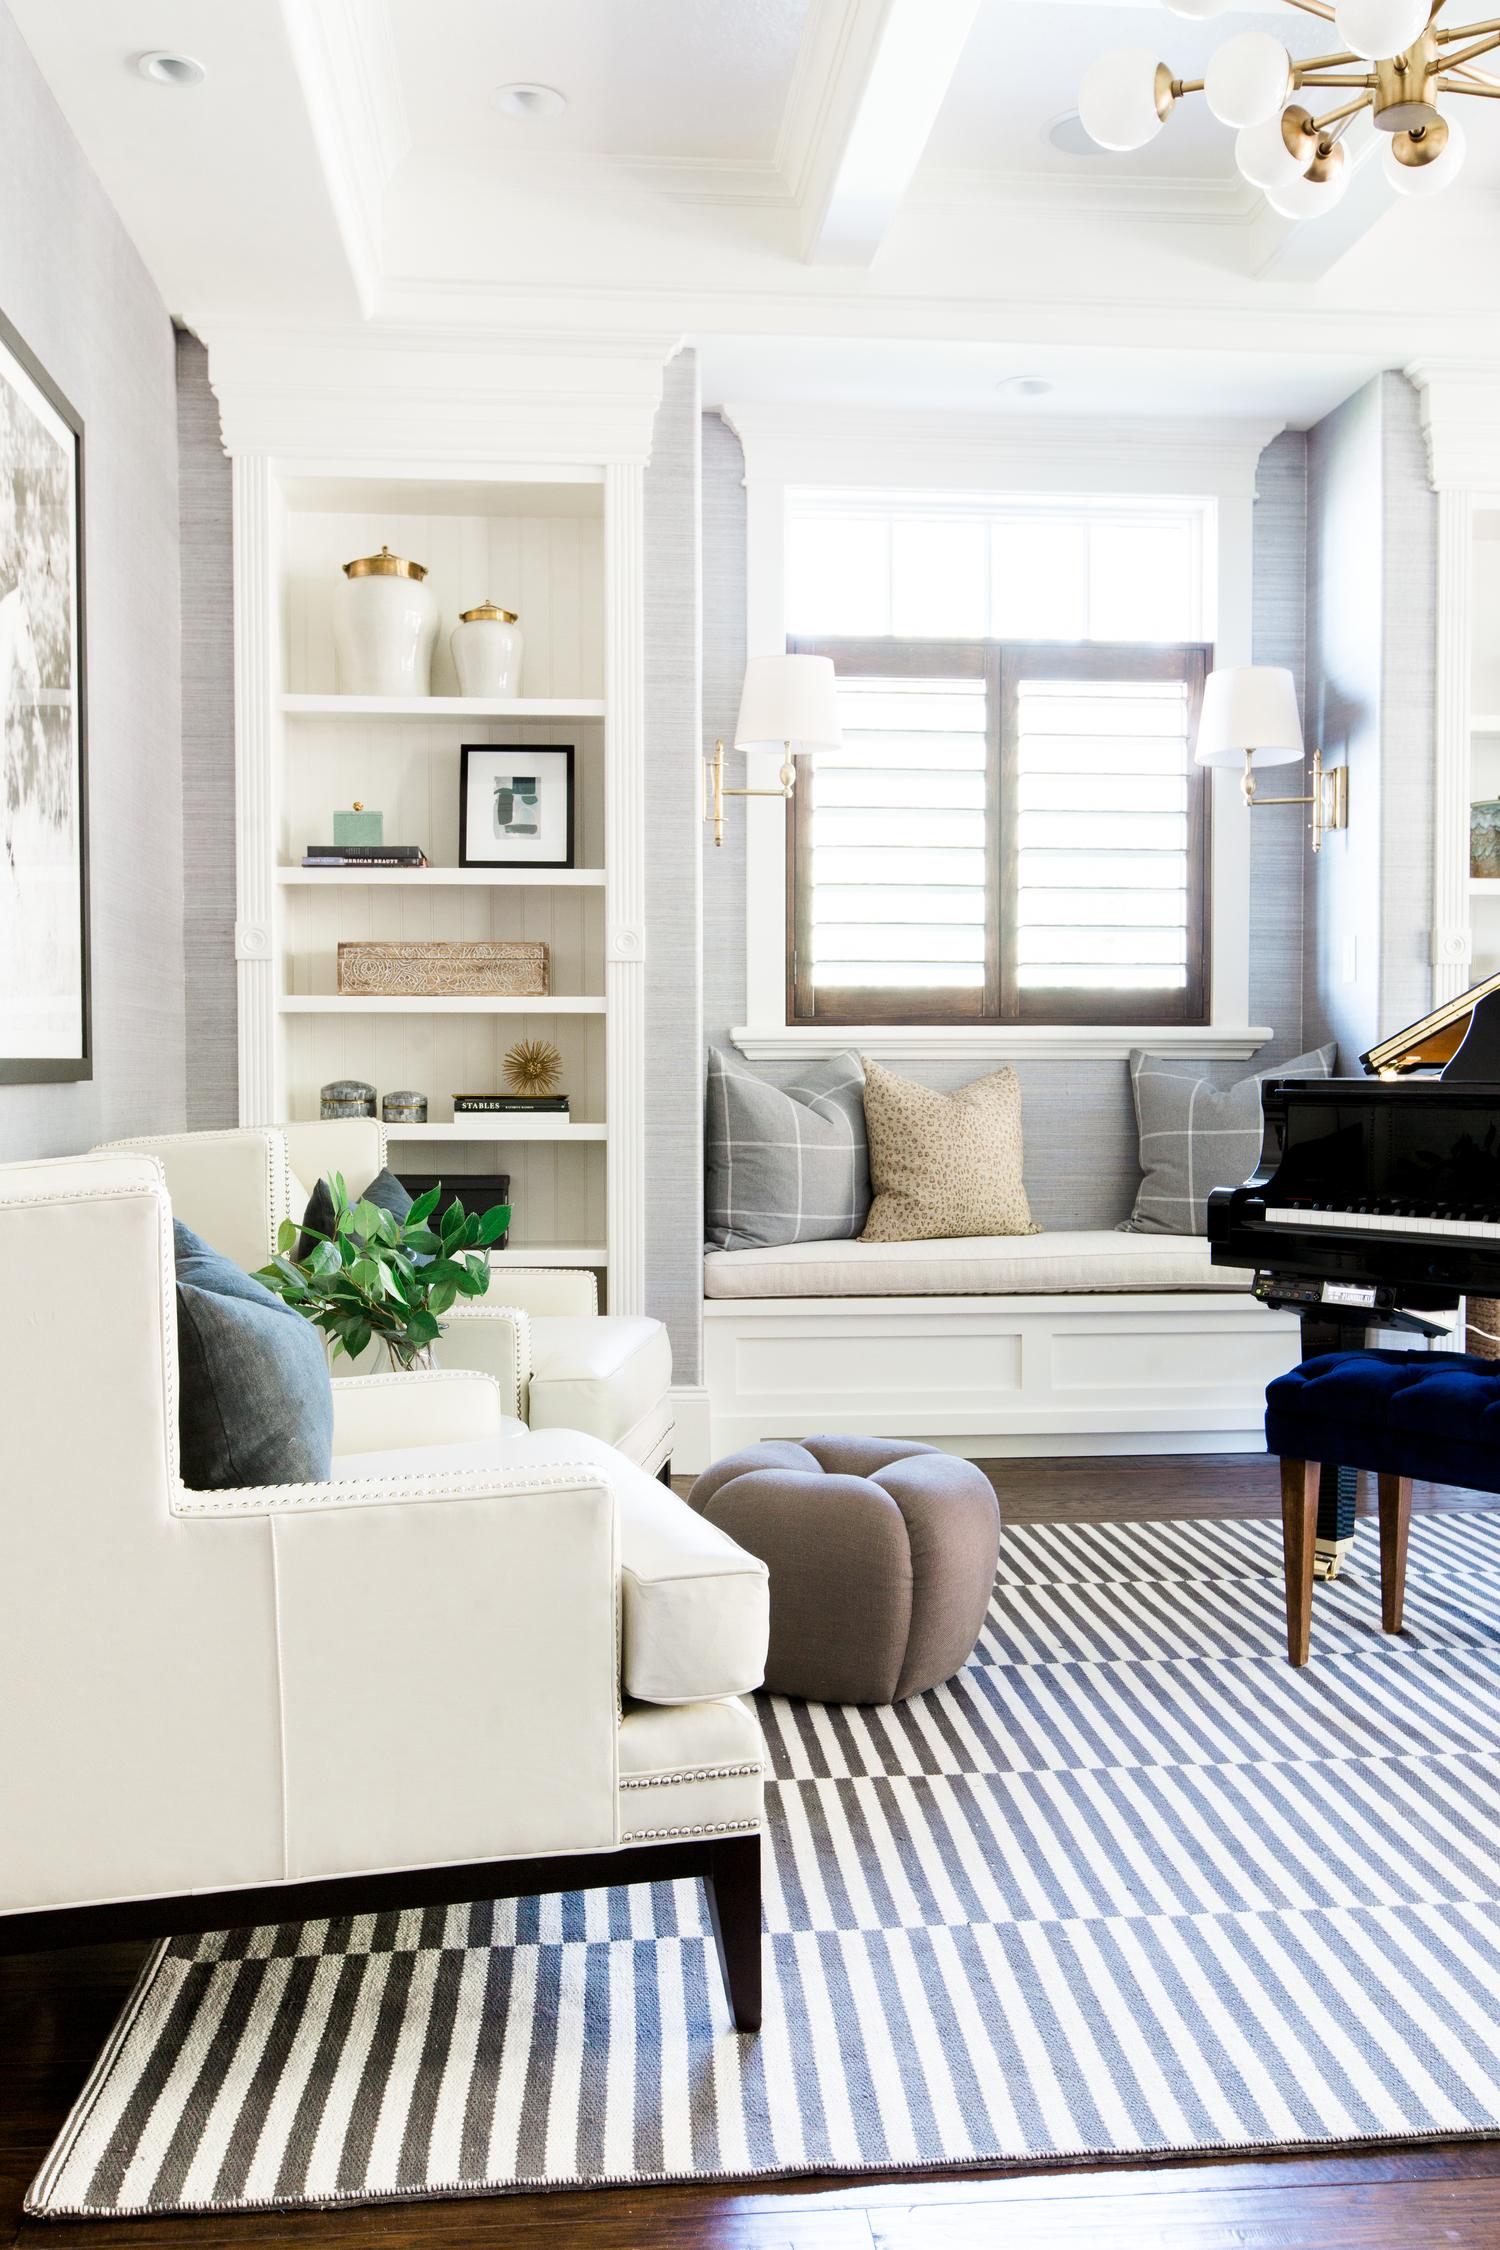 4Mountainside+remodel+piano+room+||+Studio+McGee.jpg